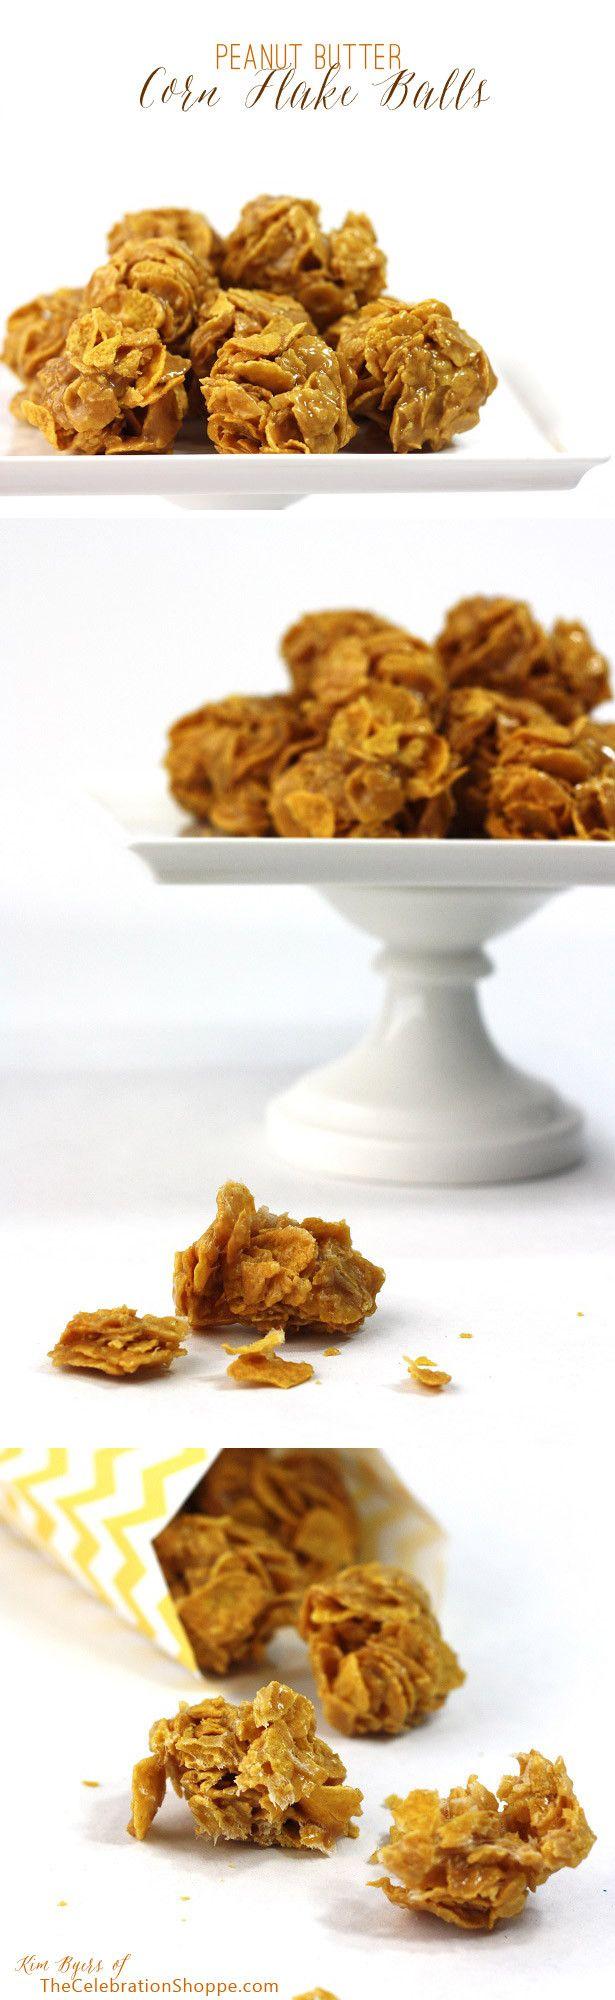 Peanut Butter Corn Flake Balls | Kim Byers, TheCelebrationShoppe.com | Warning... they're addicting! :) #cornflakes #candy #recipe